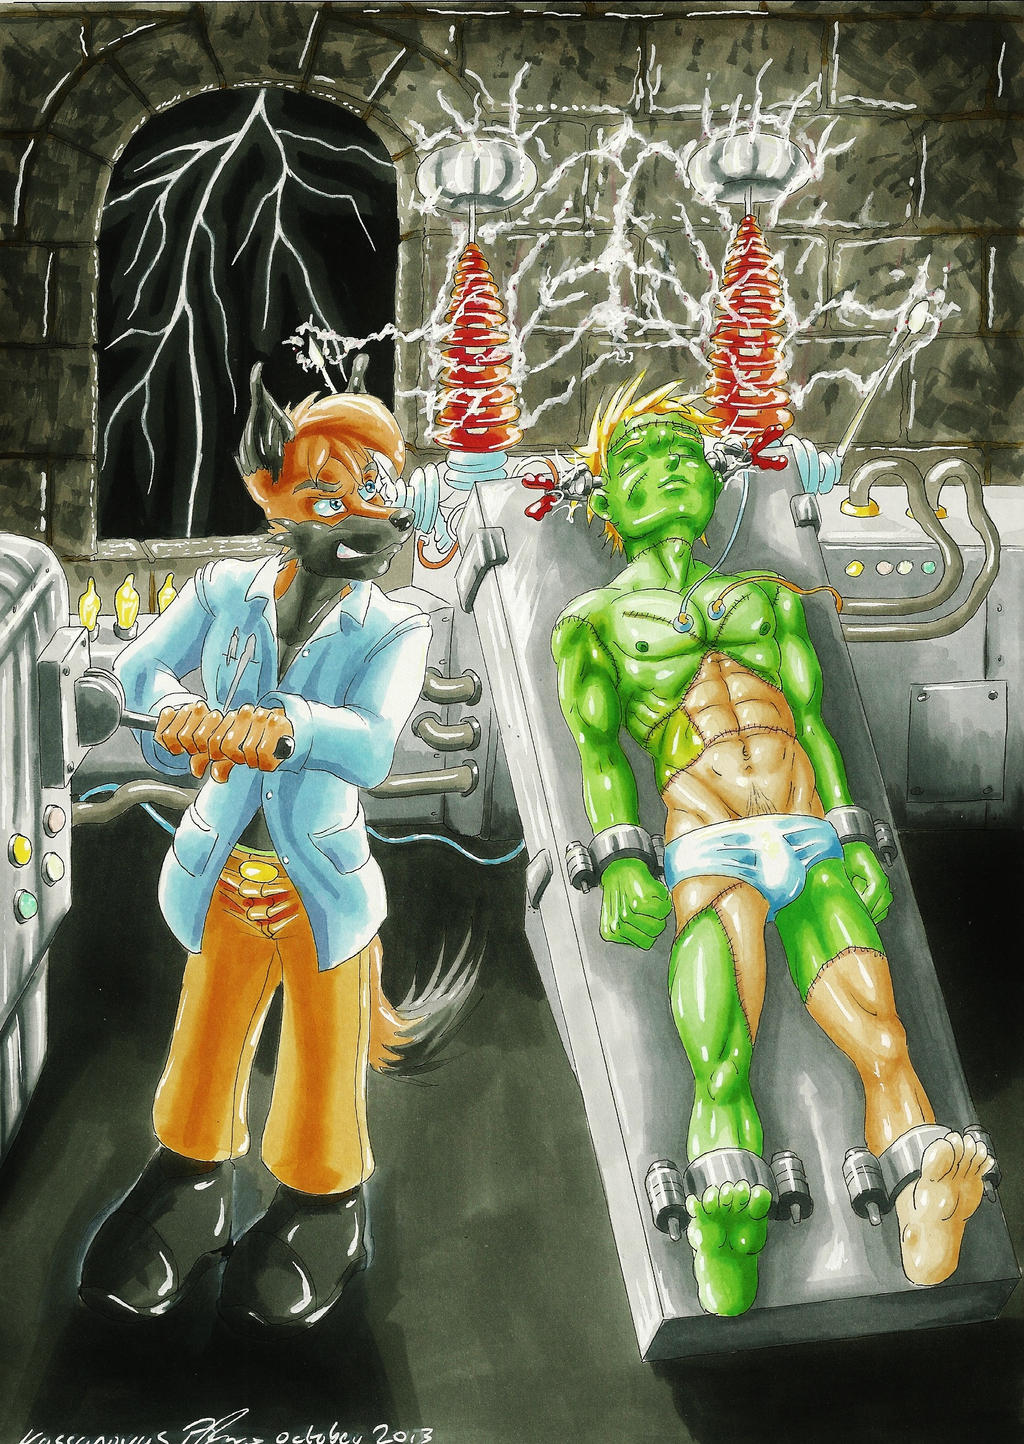 Mad Scientist by Kassanovas